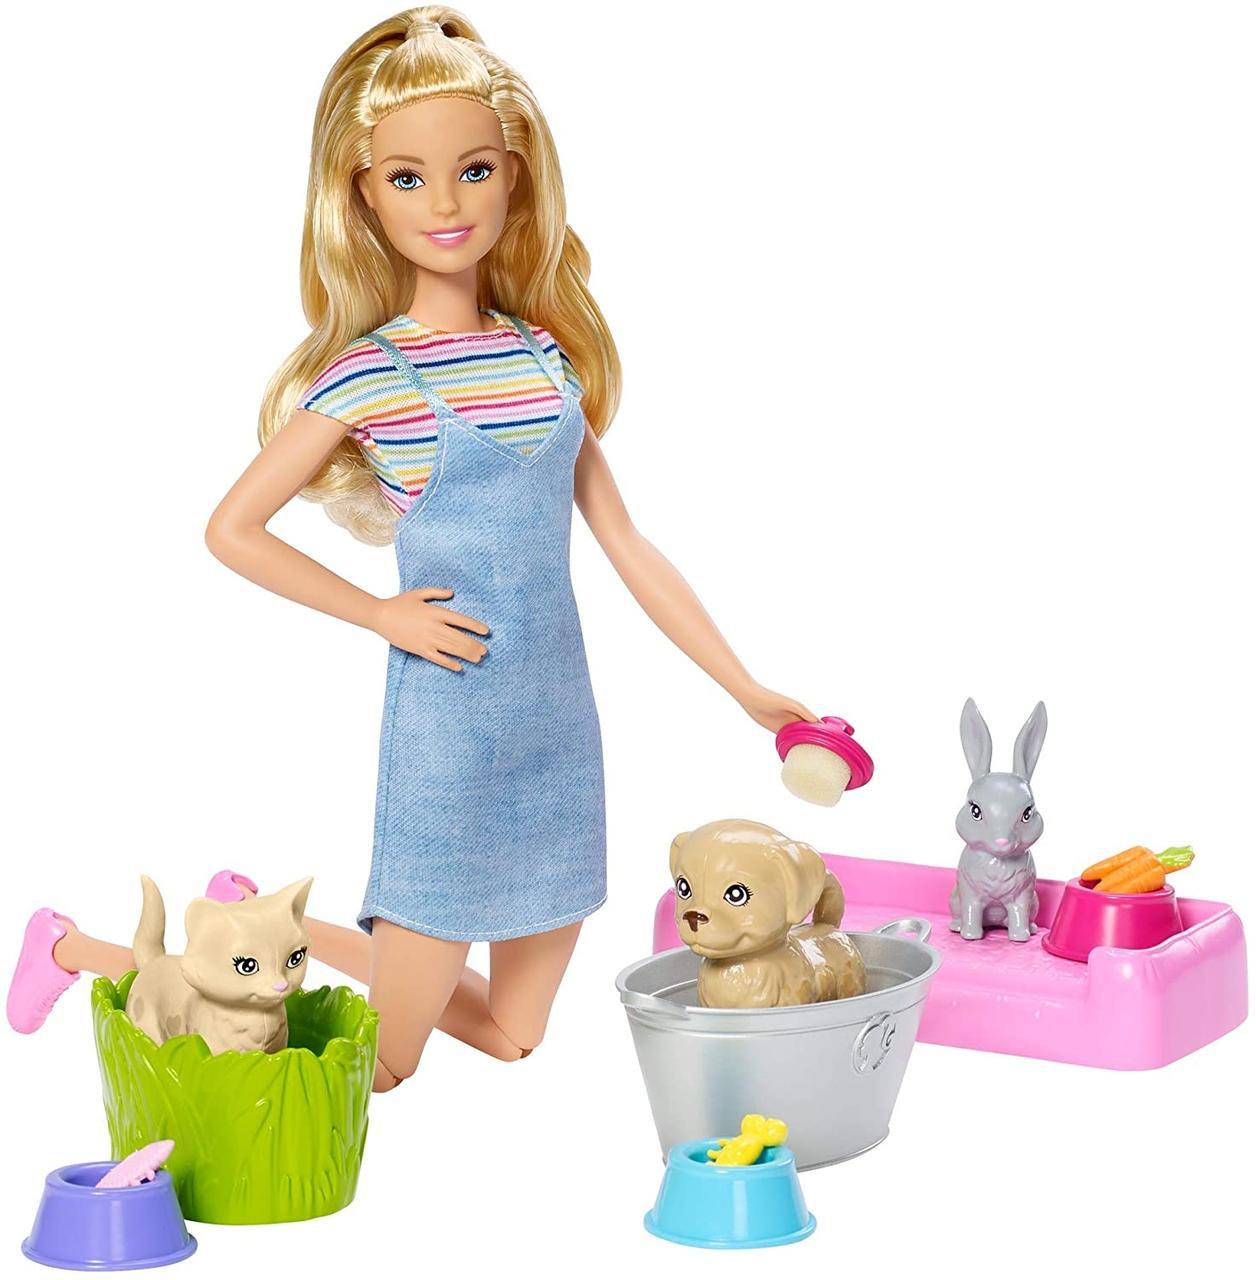 Кукла Барби купай питомцев и играй Barbie Play N Wash Pets Doll & Playset